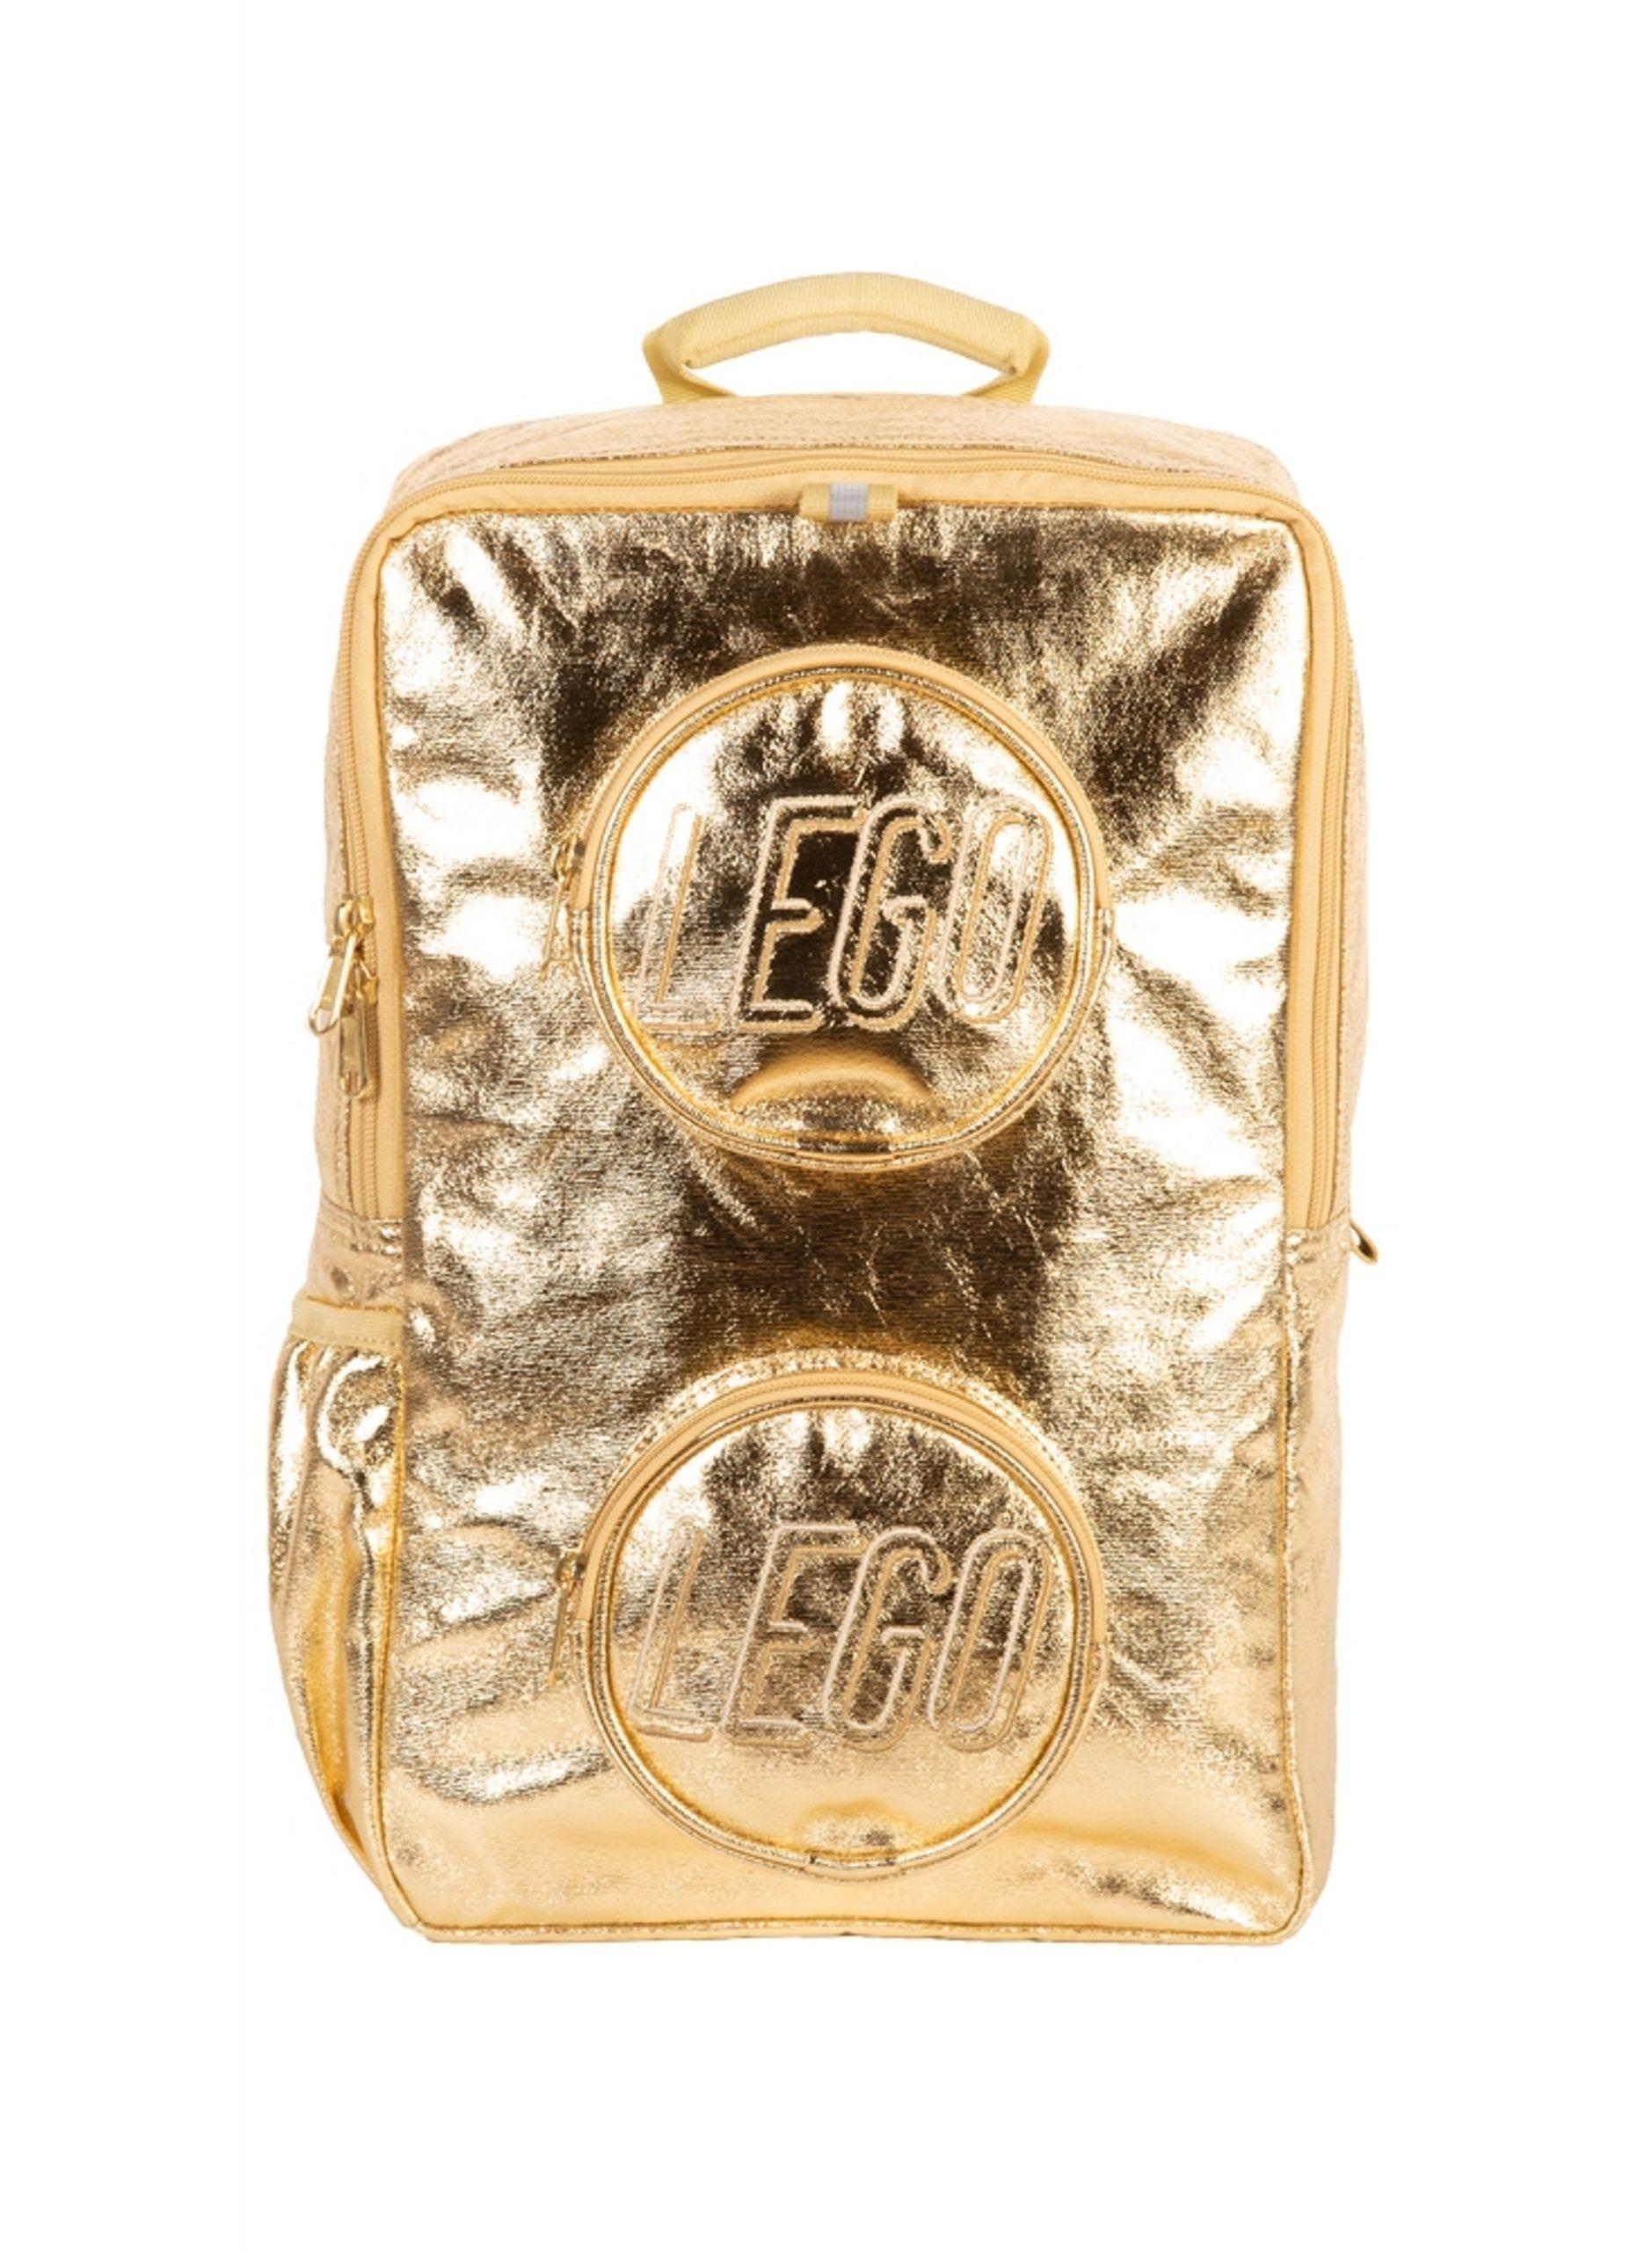 lego 5005814 gold metallic brick backpack scaled